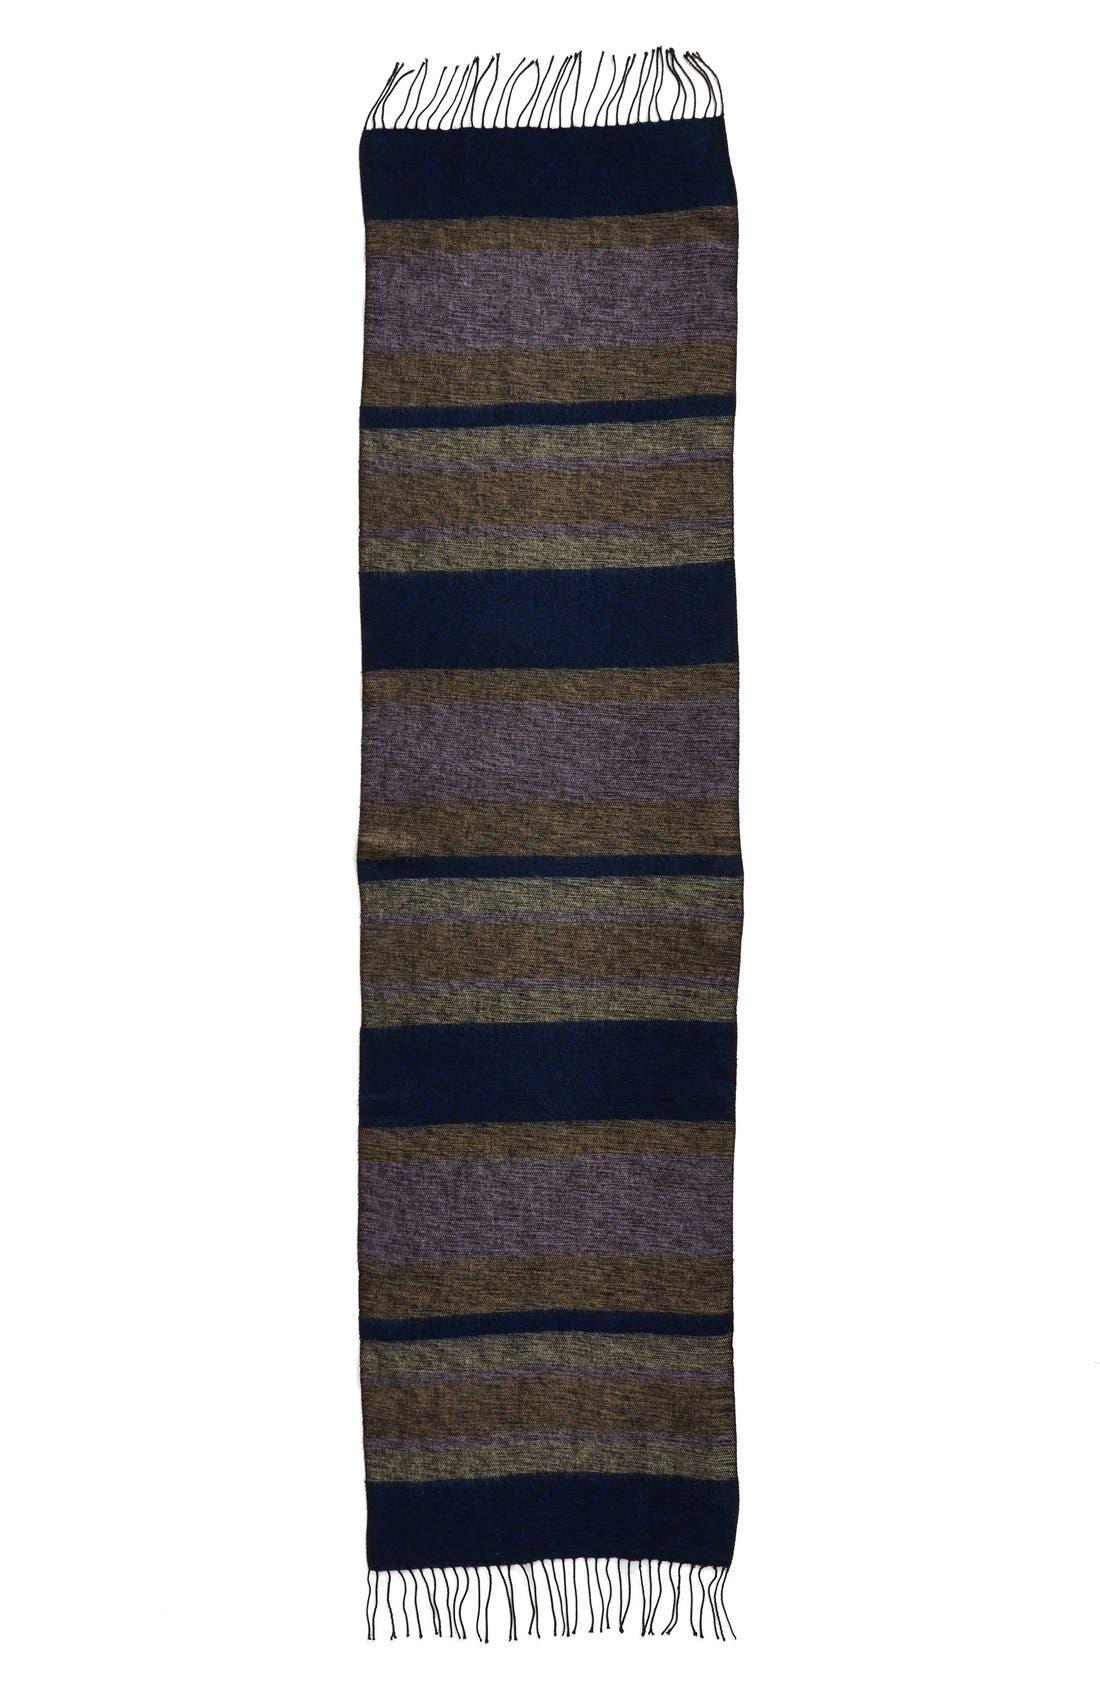 Alternate Image 1 Selected - Echo 'Meadow Stripe' Wrap Scarf